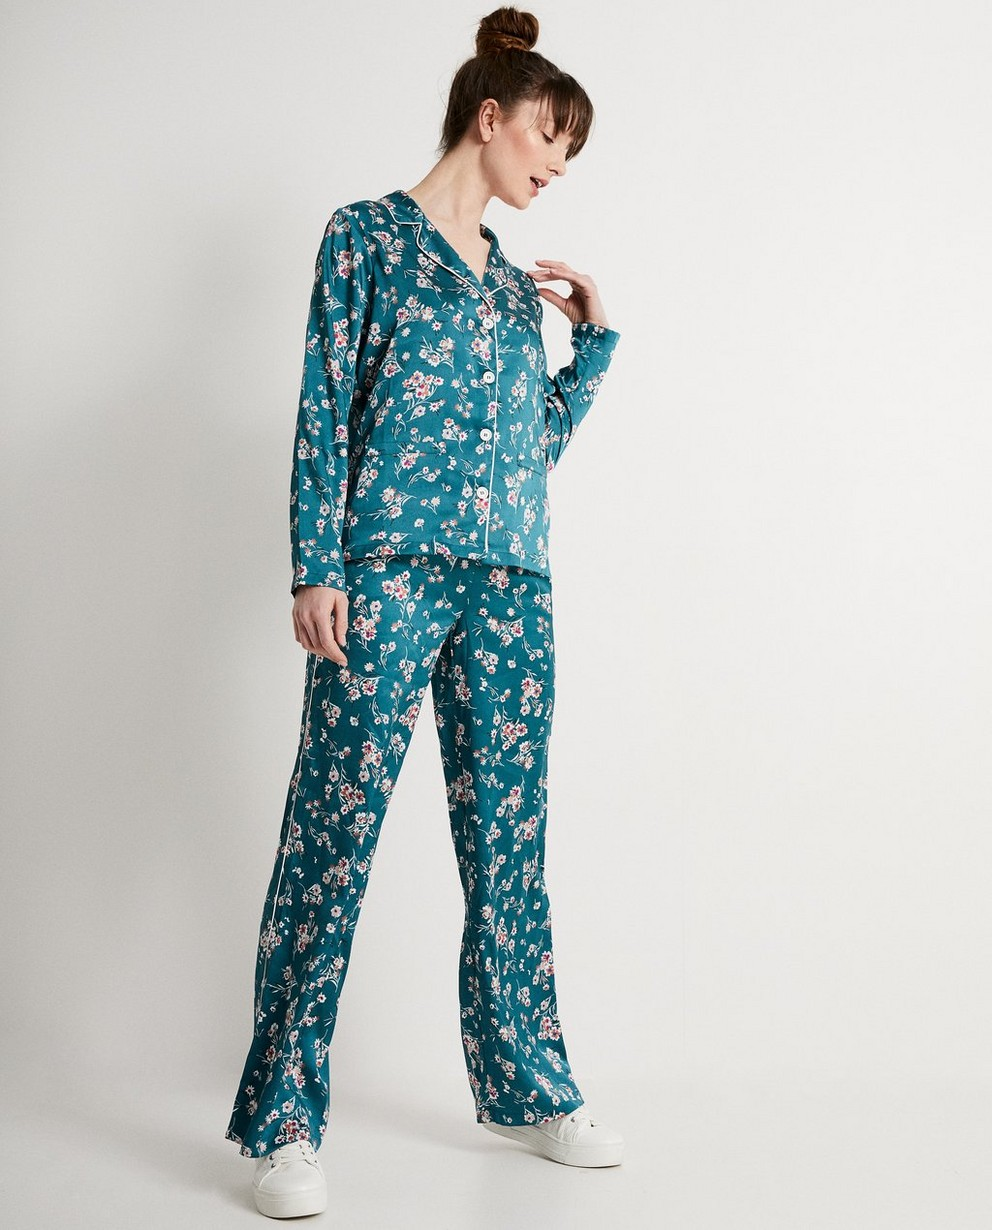 Kimonohemd met bloemenprint  - In groen - JBC